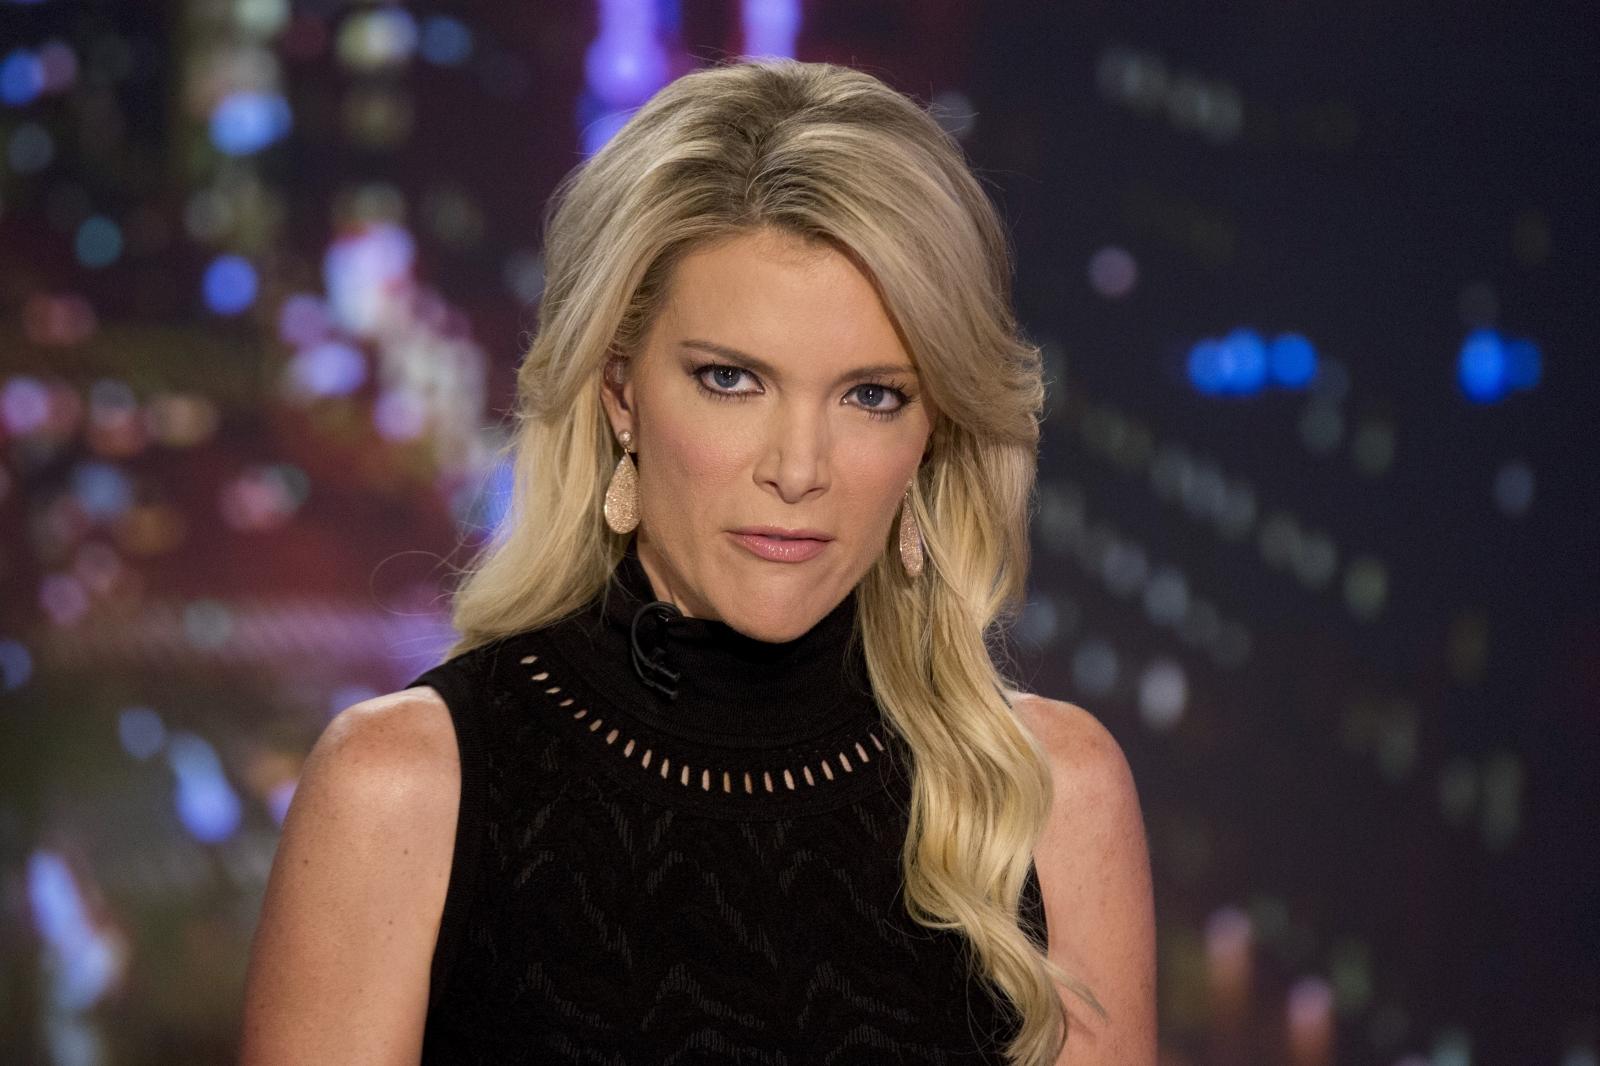 Megyn Kelly Fox News star